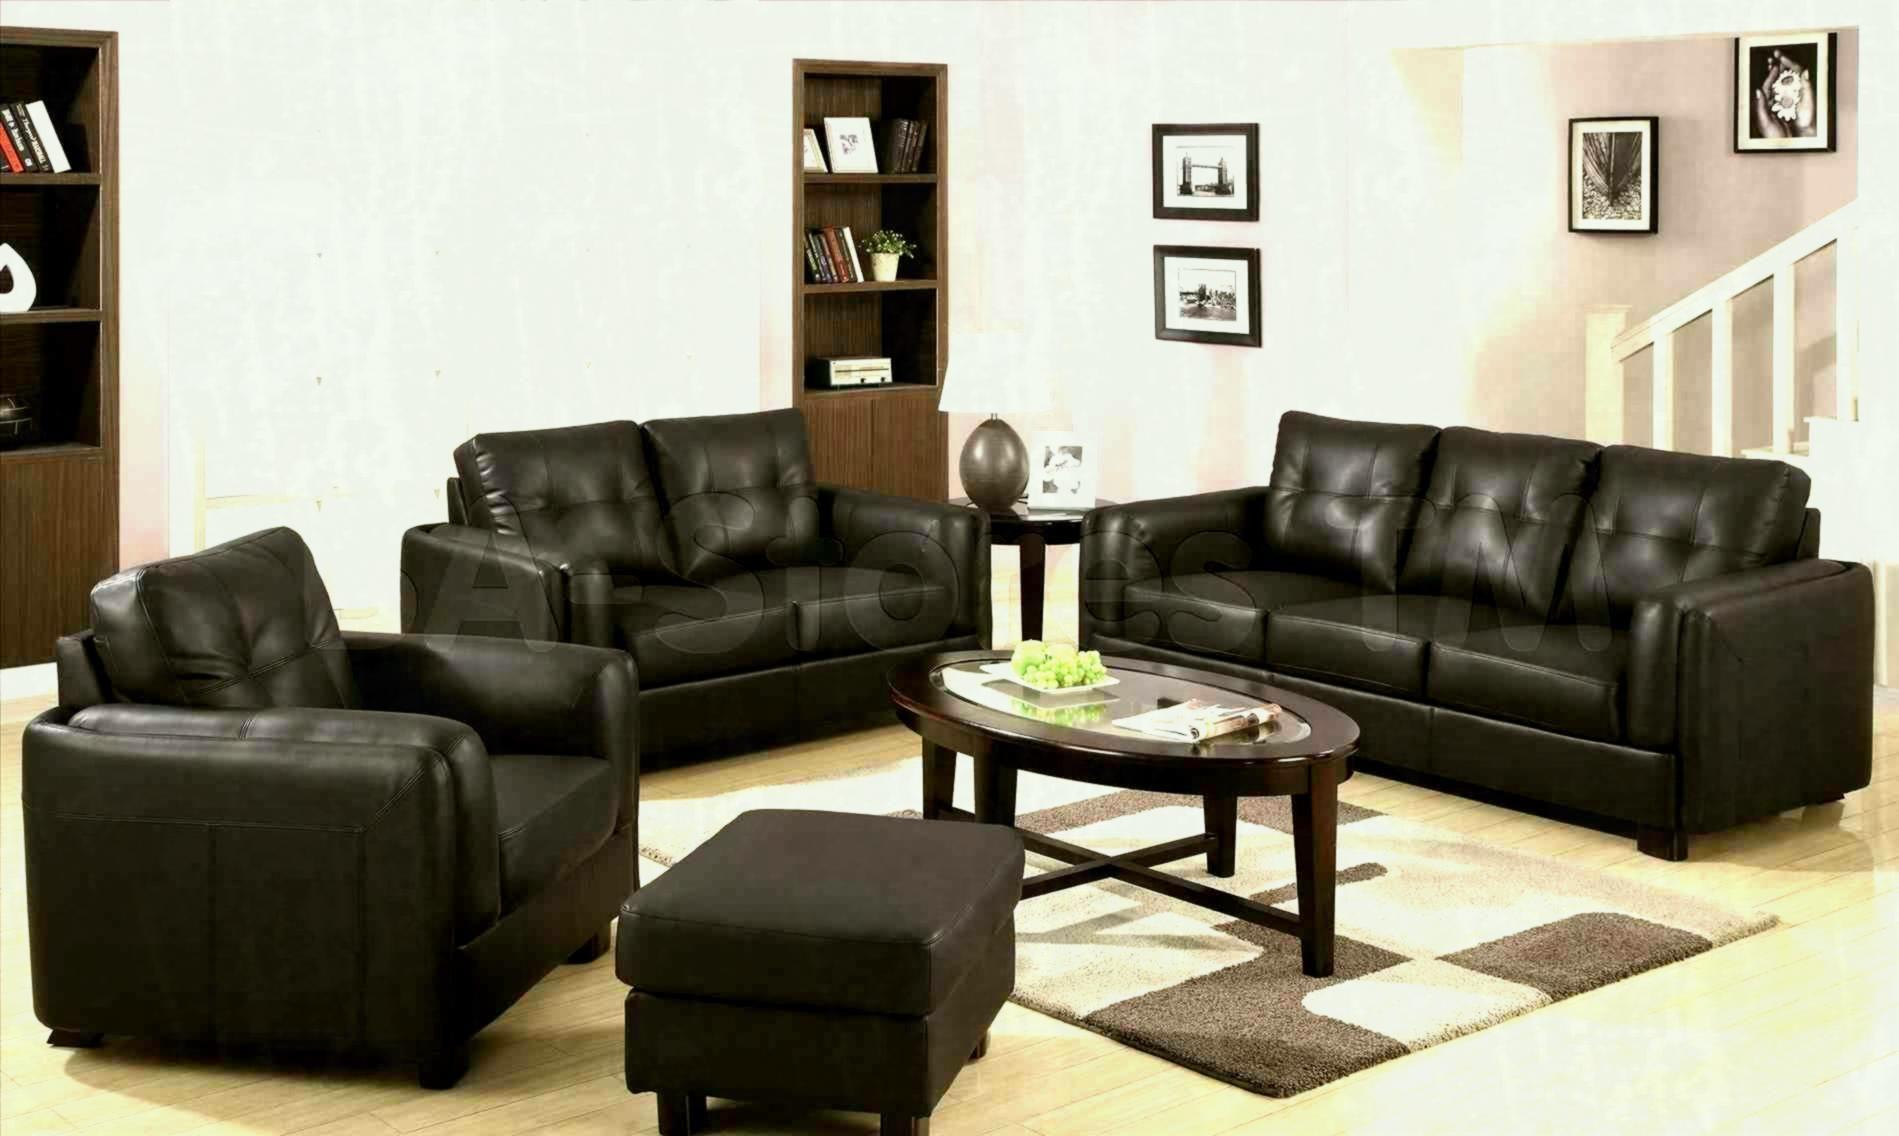 20 Elegant Lounge Room Near Me In 2020 Cheap Living